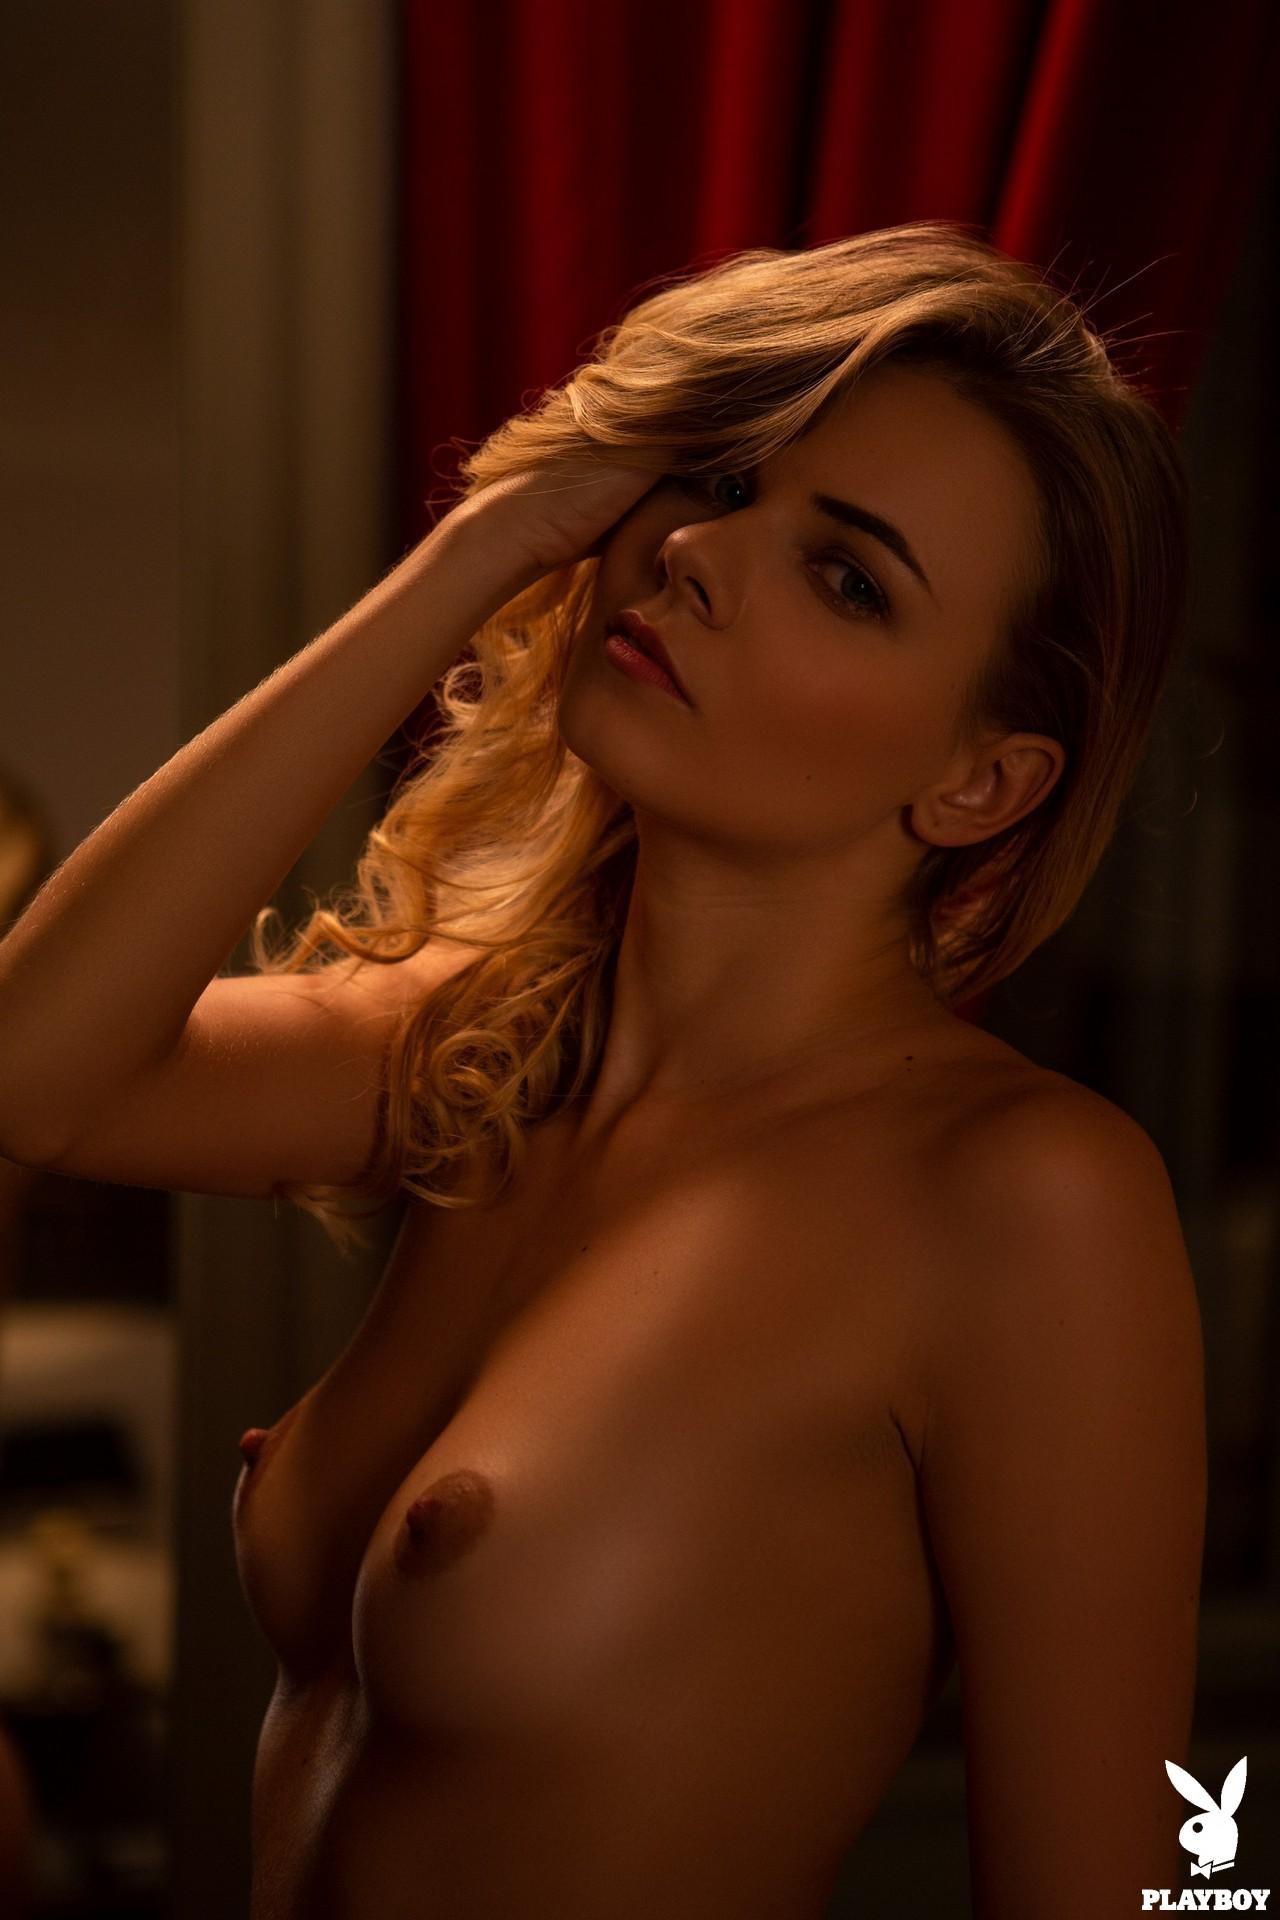 Kate Jones in Exquisite Allure - Playboy Plus 9